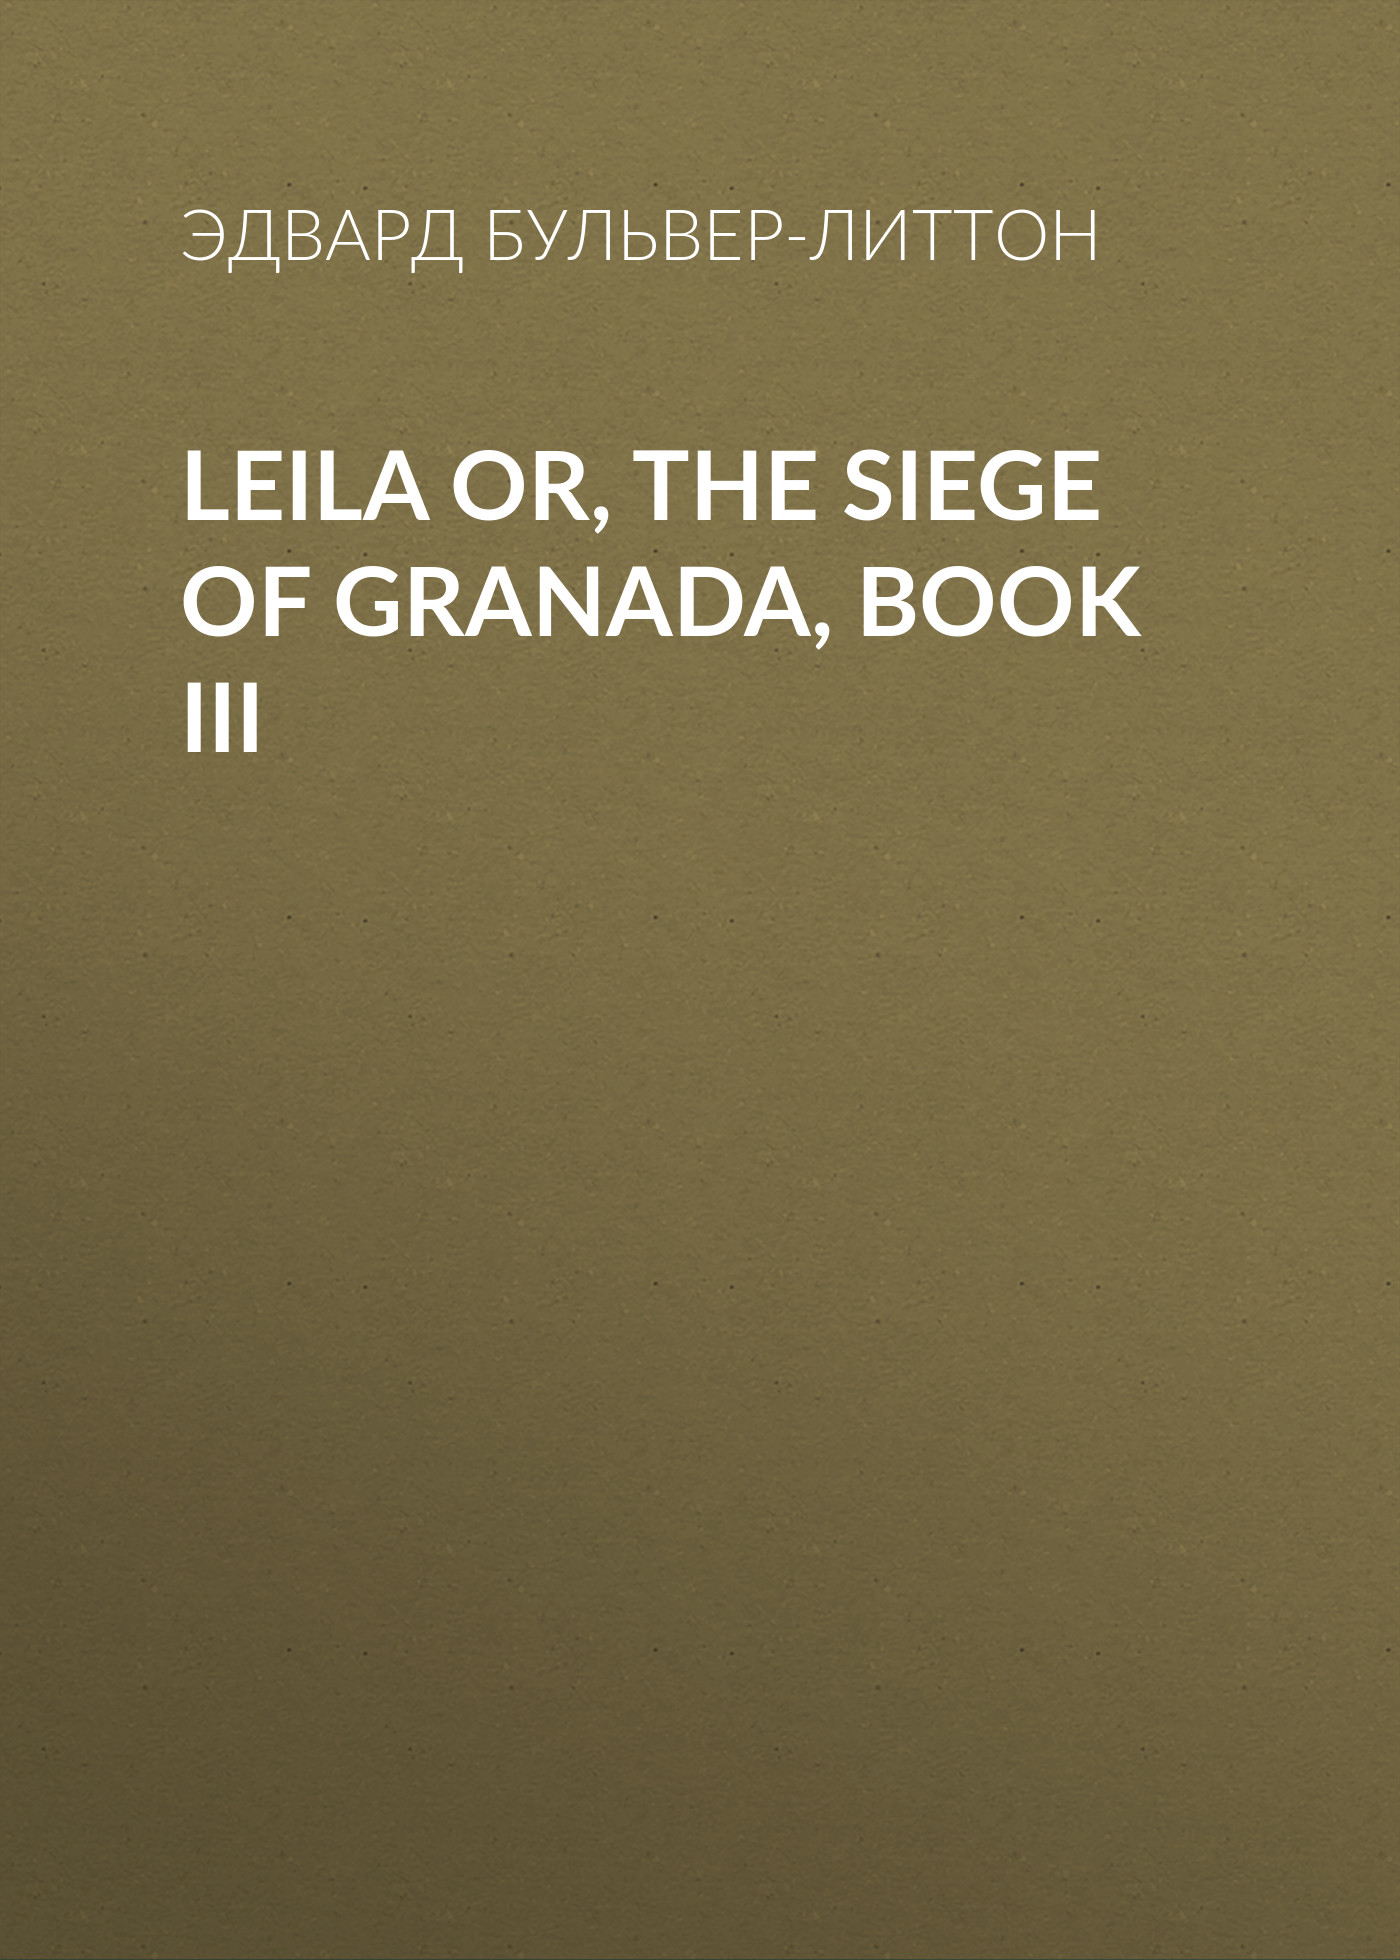 цена Эдвард Бульвер-Литтон Leila or, the Siege of Granada, Book III